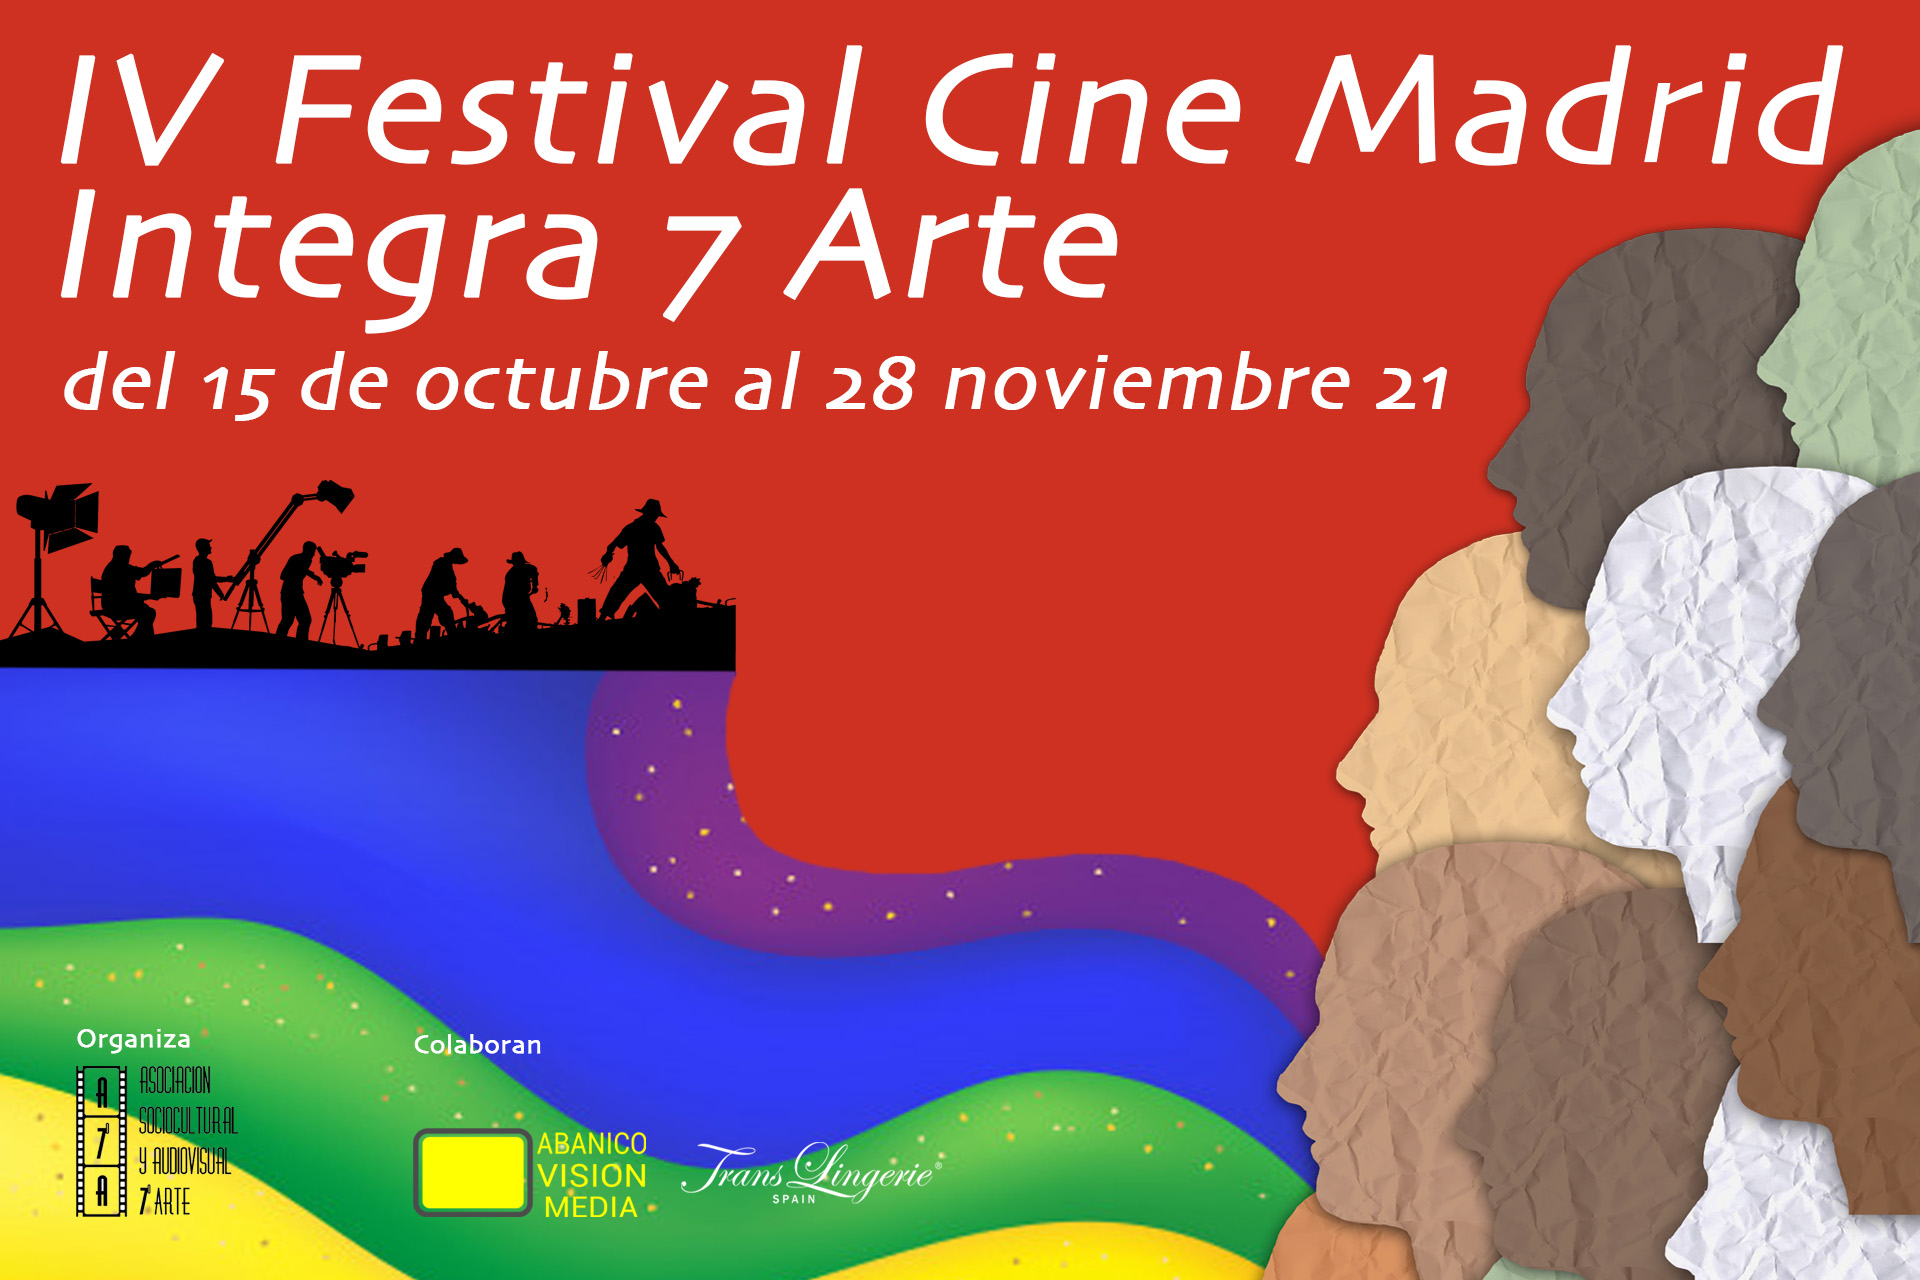 Cartel IV Festival Cine Madrid Integra 7Arte